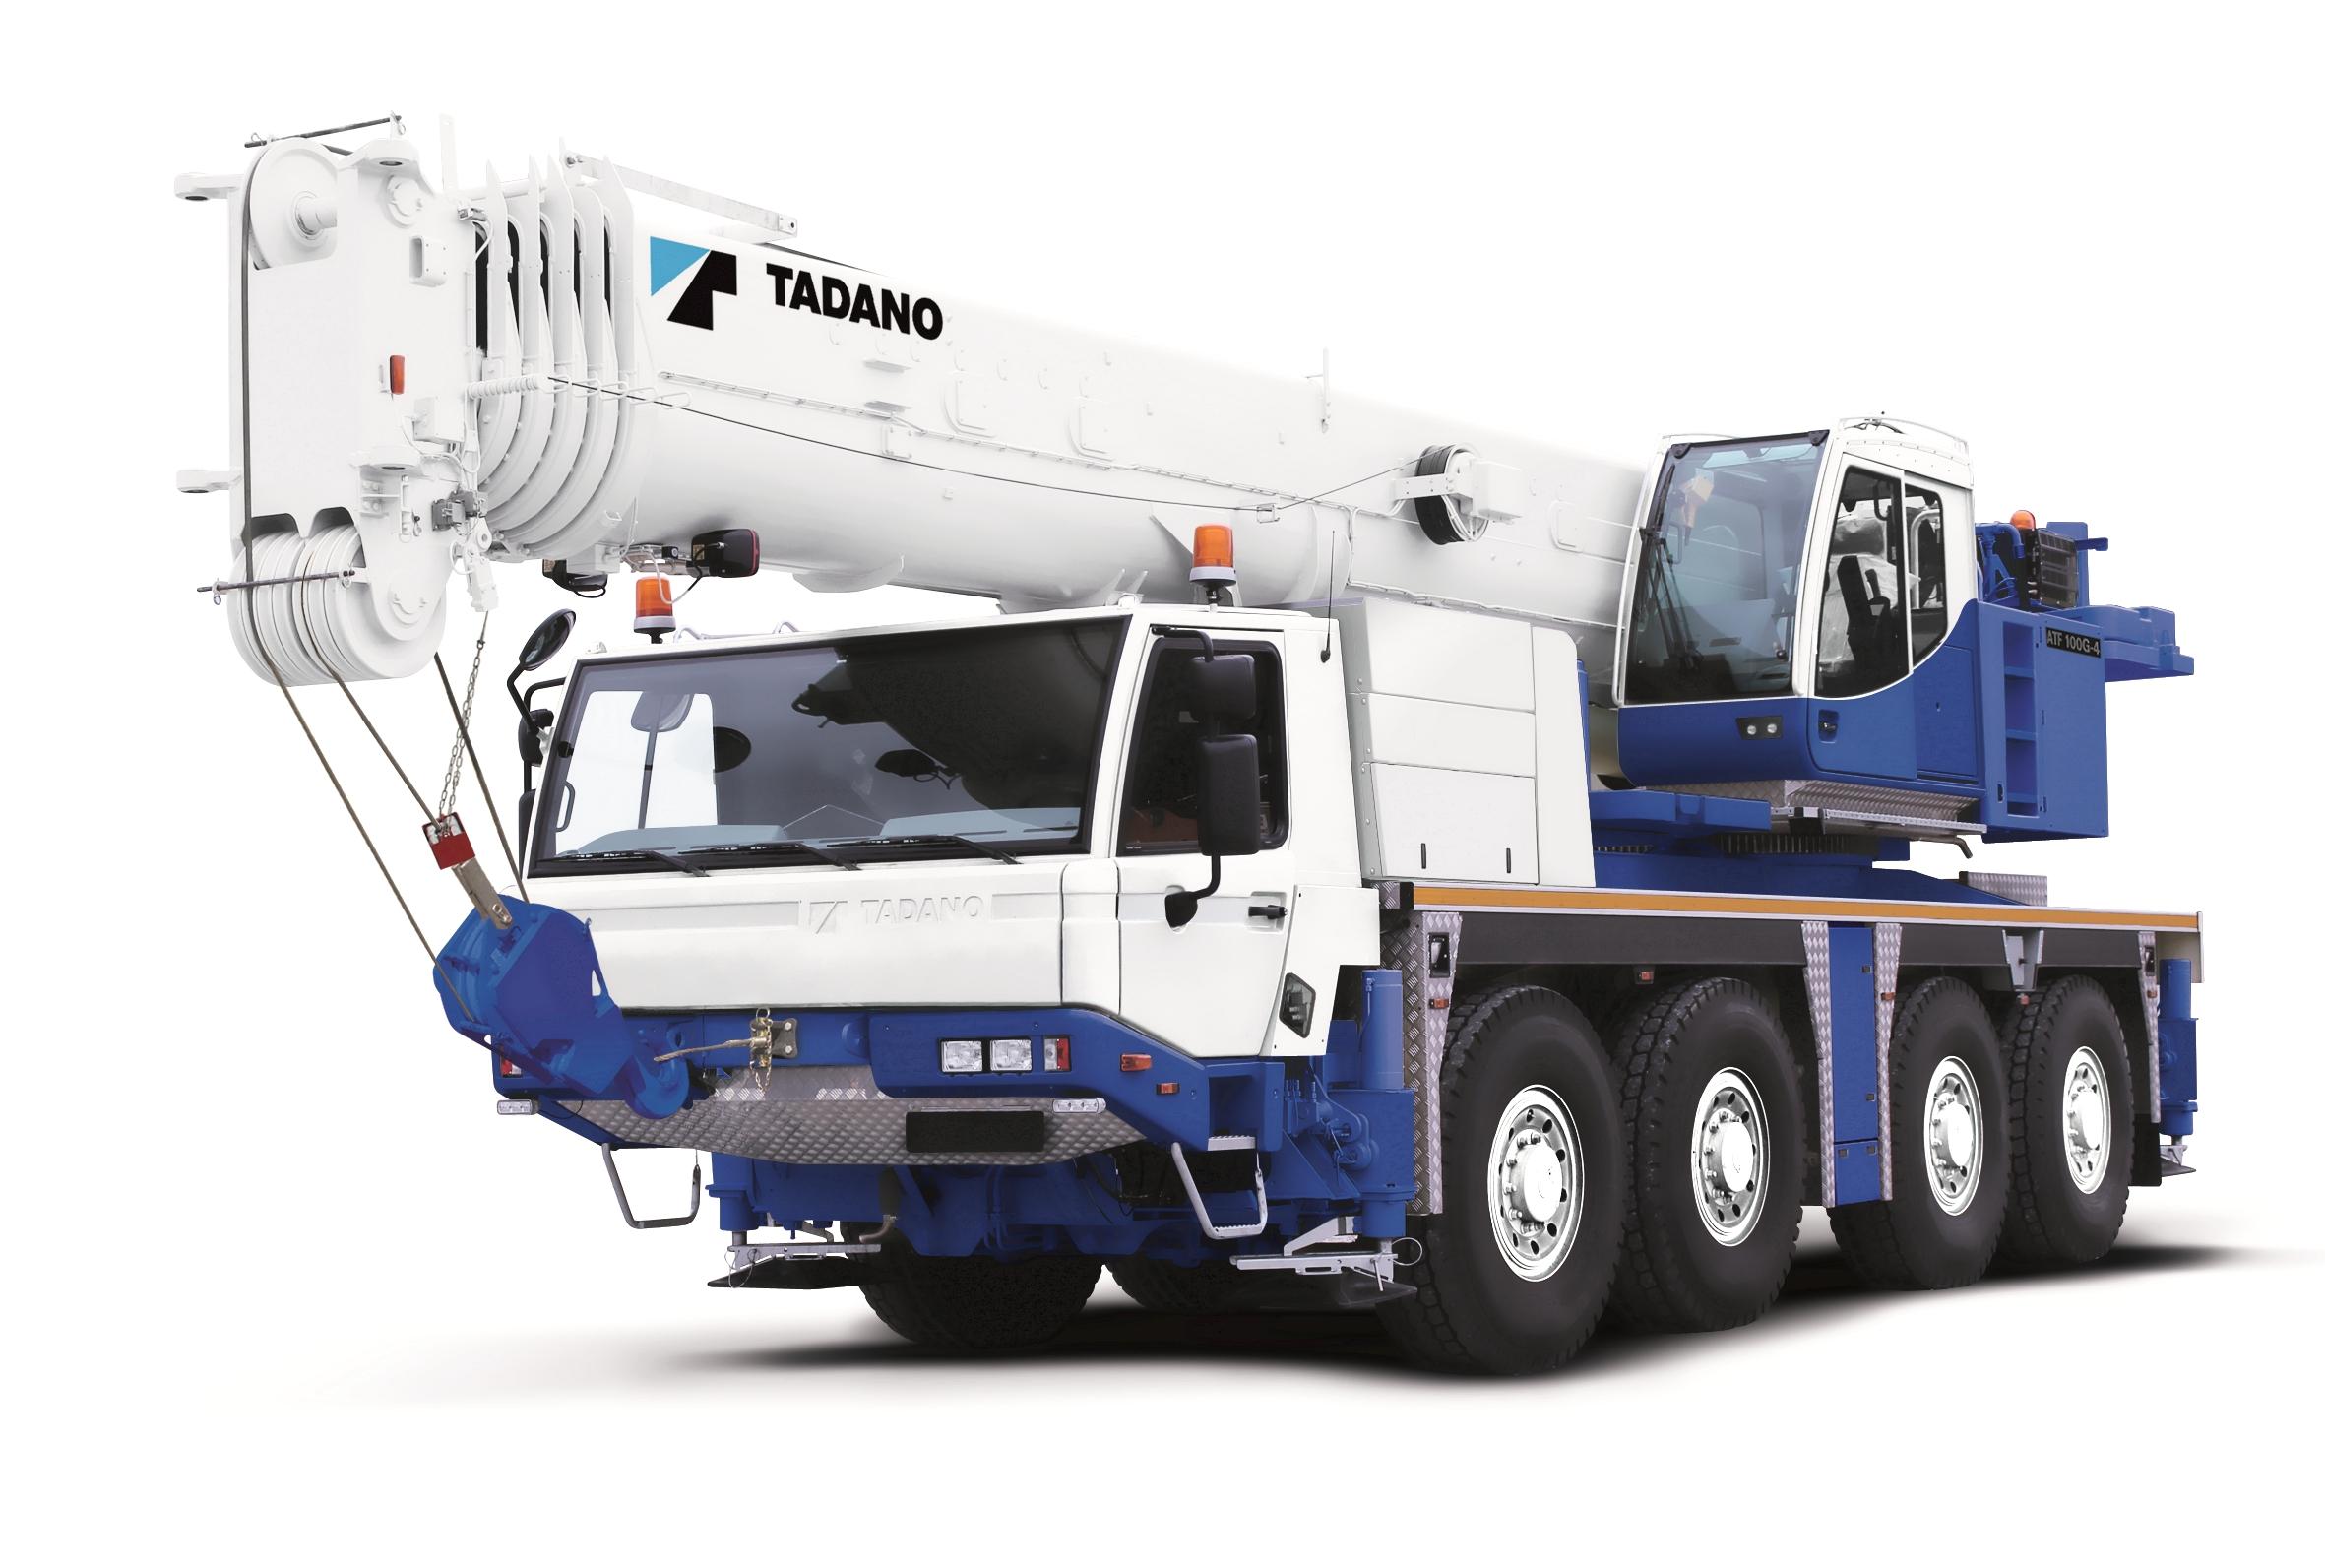 Кран Tadano ATF 100G-4 - stroyone.com